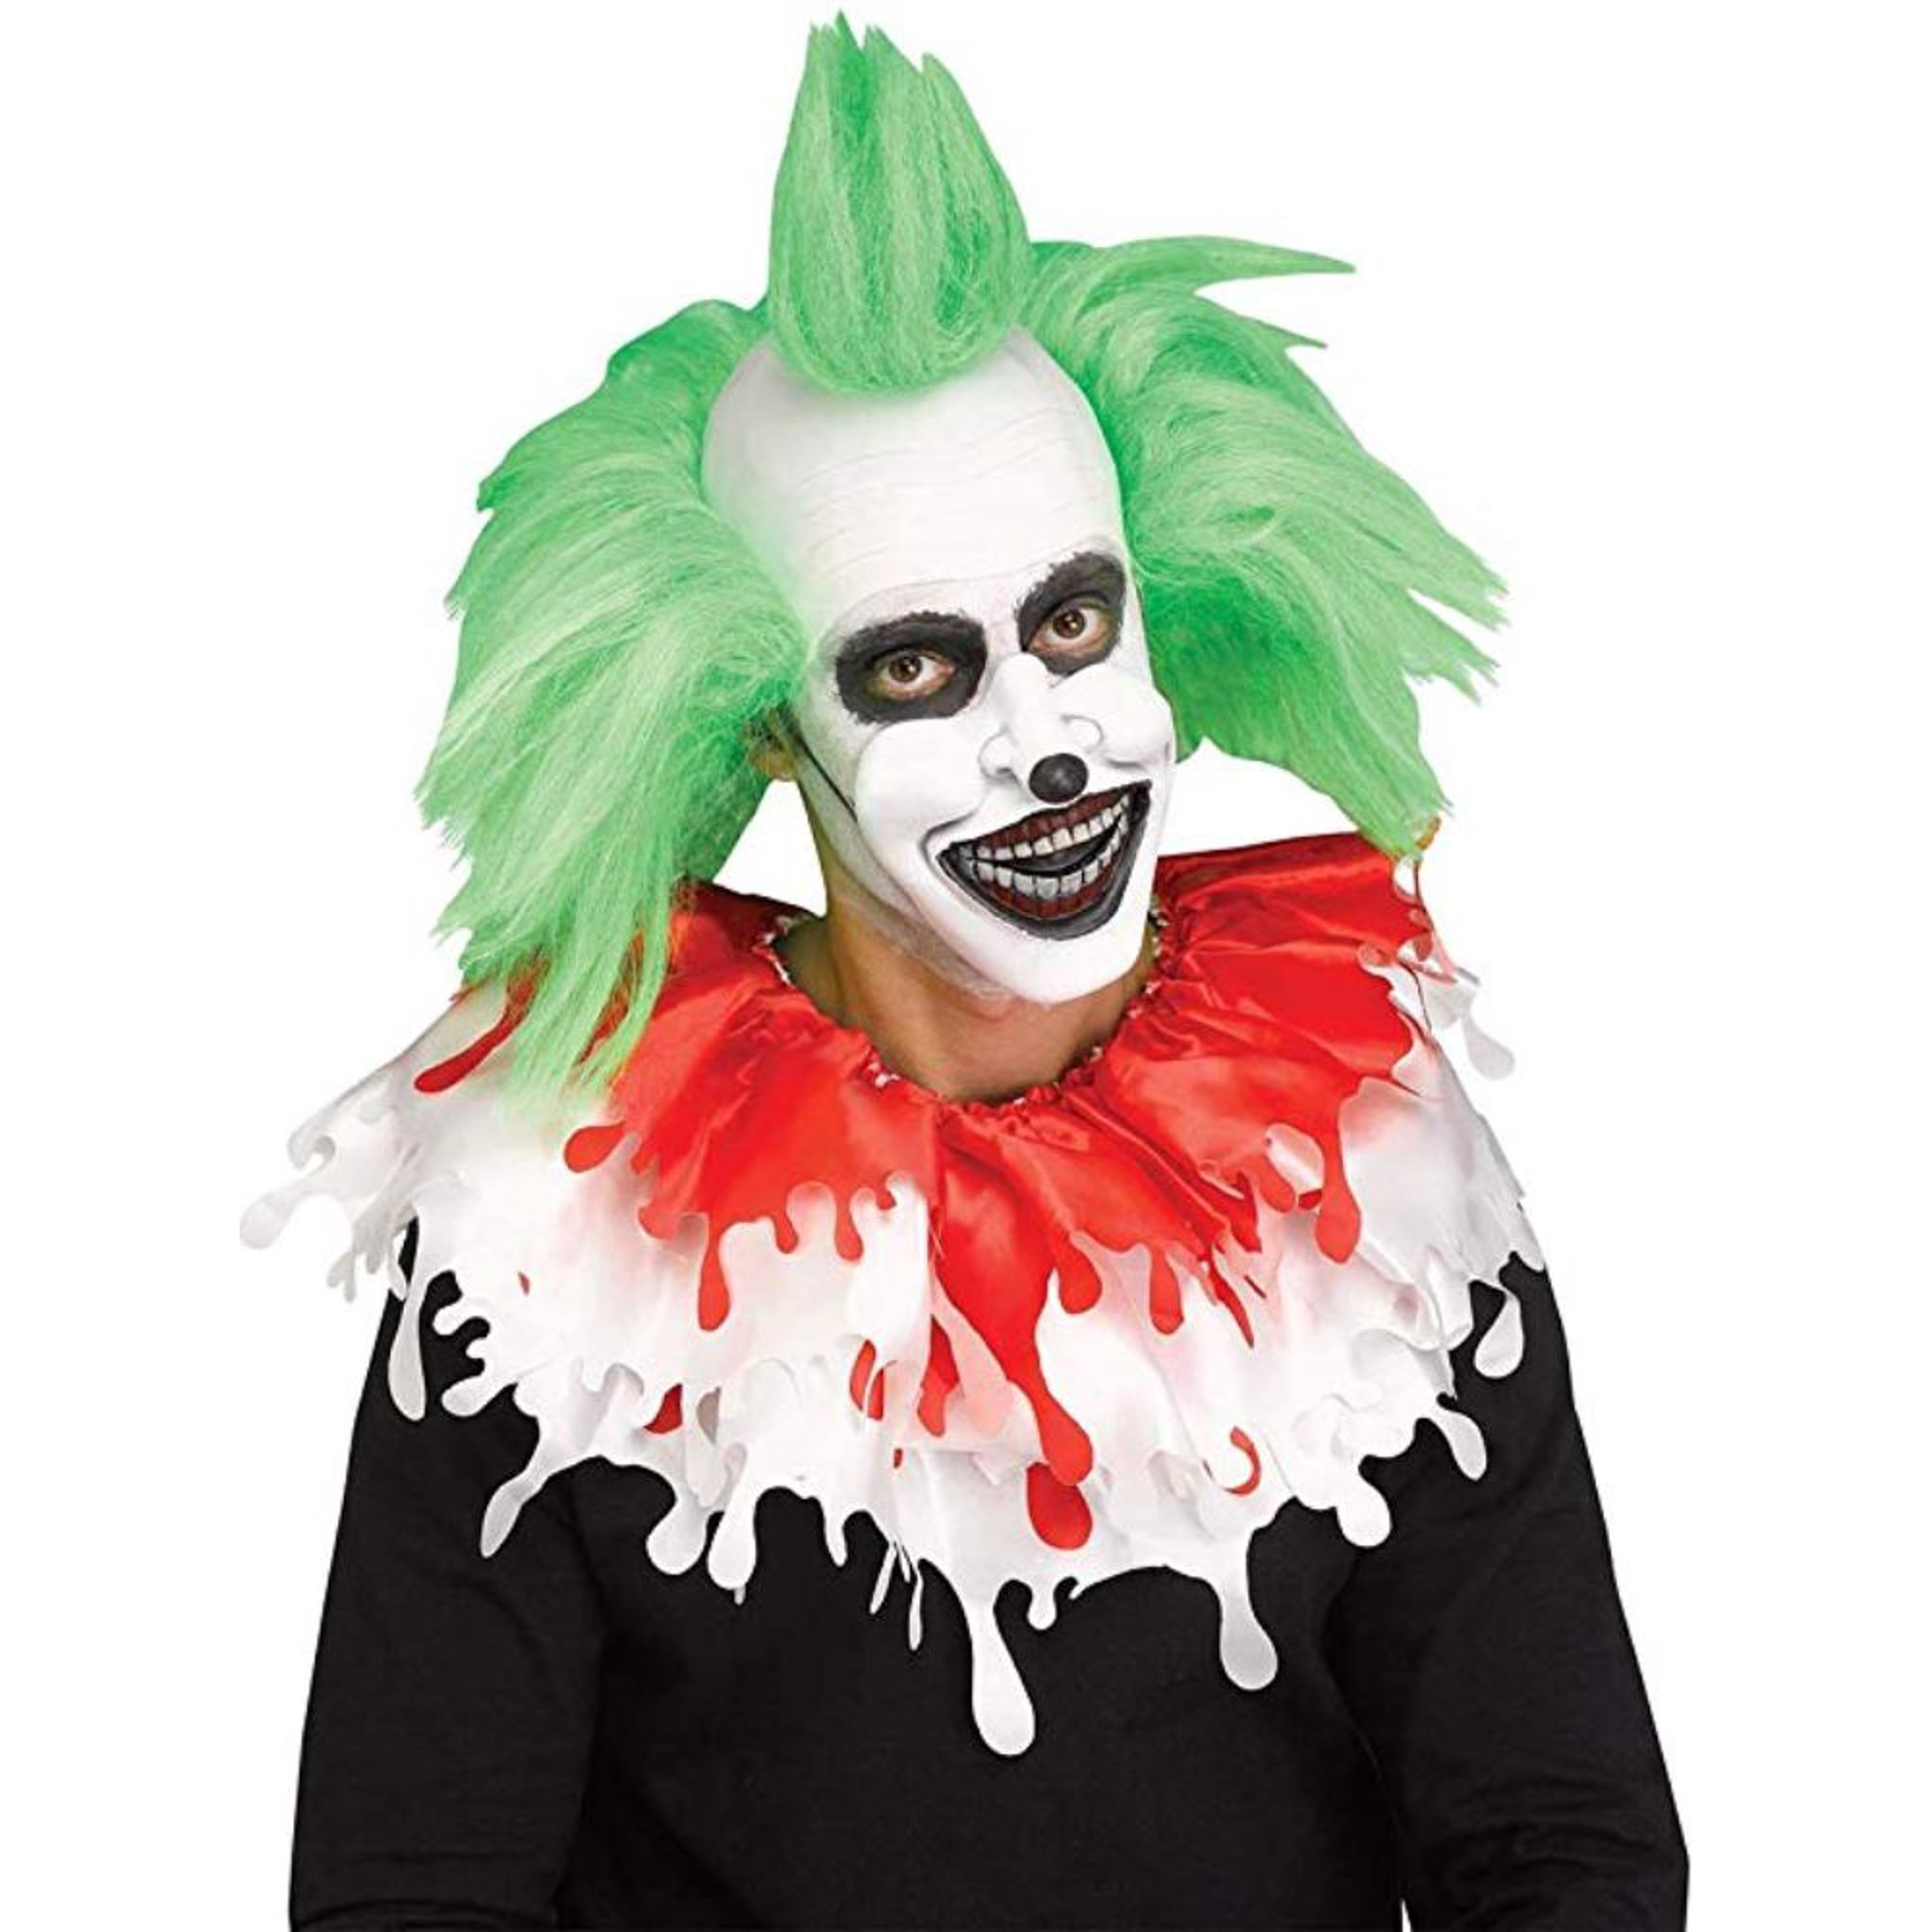 Creepy Evil Clown Half Mask Mouth Piece Vinyl Latex White Scary Black Nose Walmart Canada